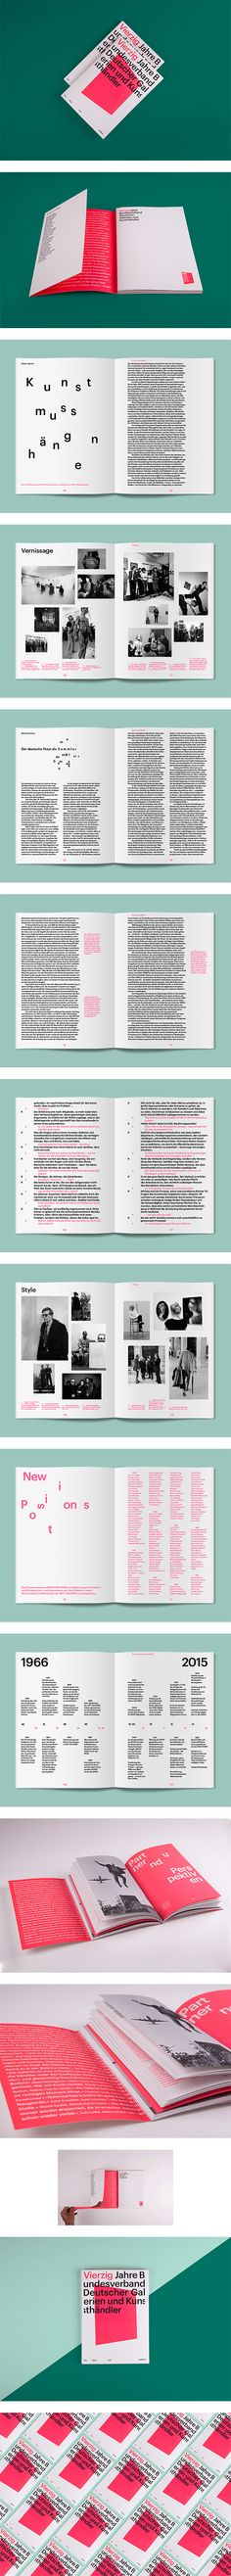 BVDG — Book for a Jubilee